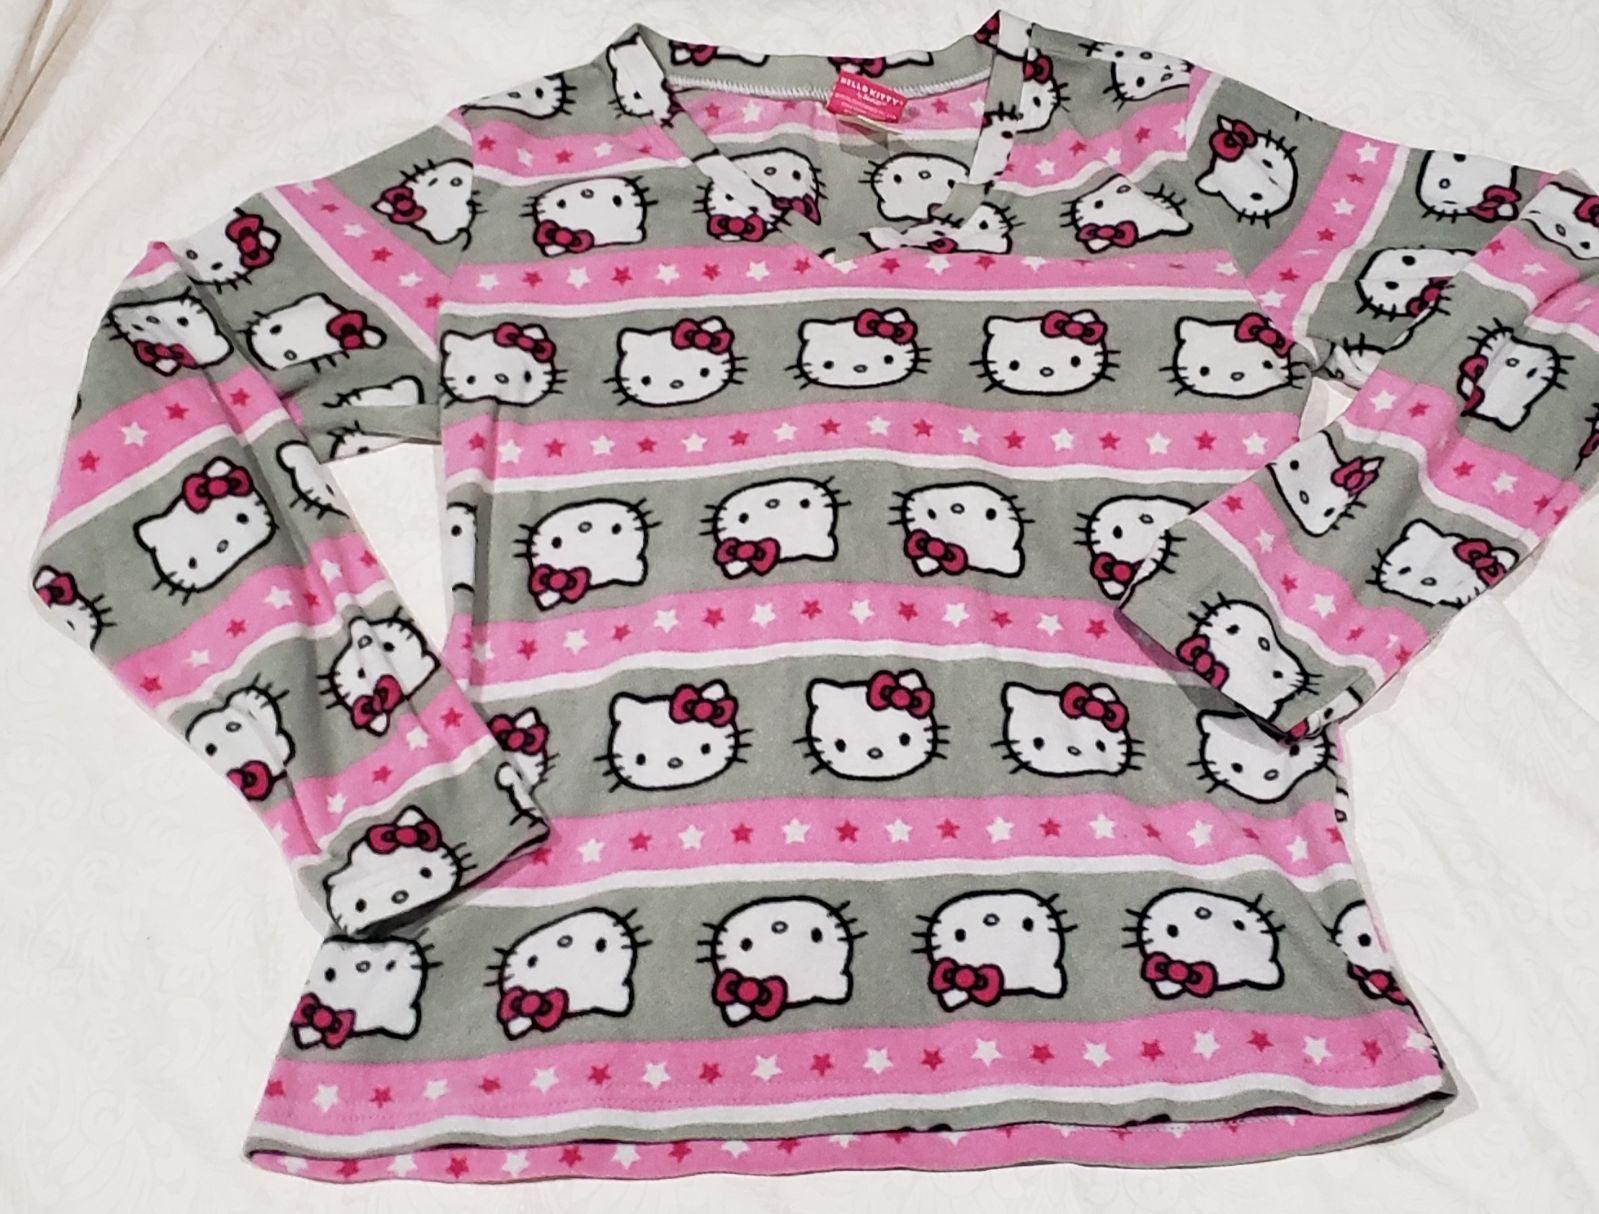 Holly kitty sleepwear 7/8